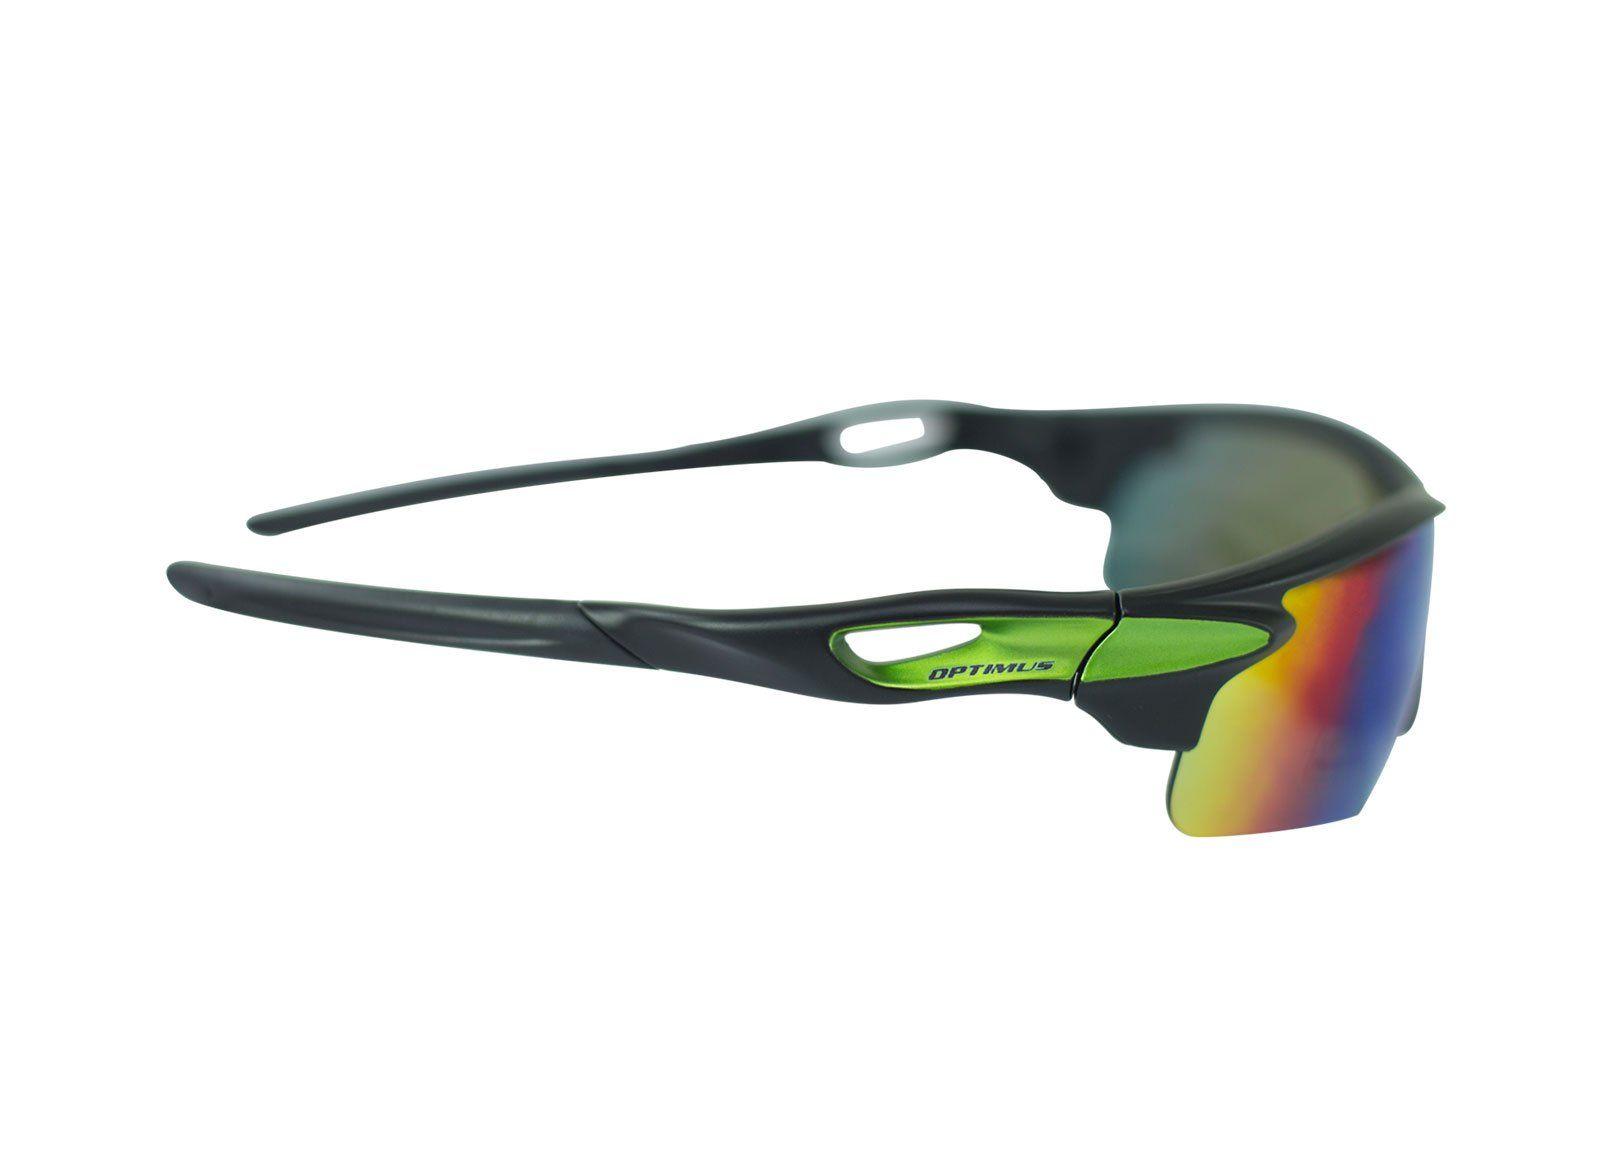 gafas para ciclismo marca optimus, gafas para mountain bike, gafas ...